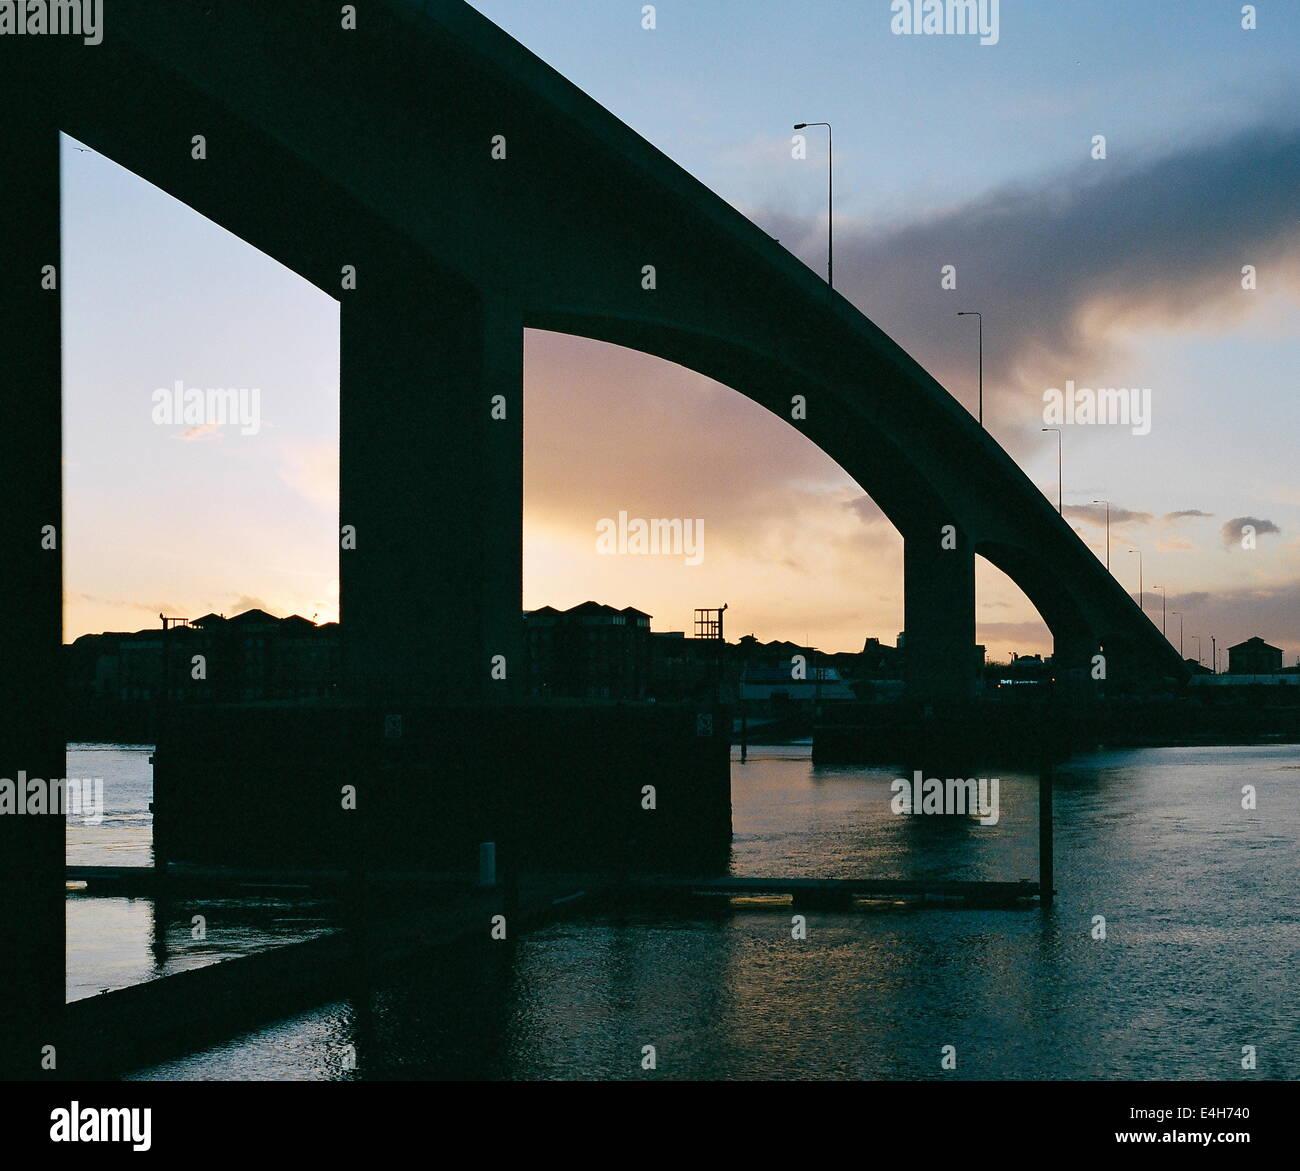 WOOLSTON,ENGLAND-REINFORCD CONCRETE SPANS OF THE ITCHEN BRIDGE;PHOTO:JONATHAN EASTLAND/AJAX. - Stock Image